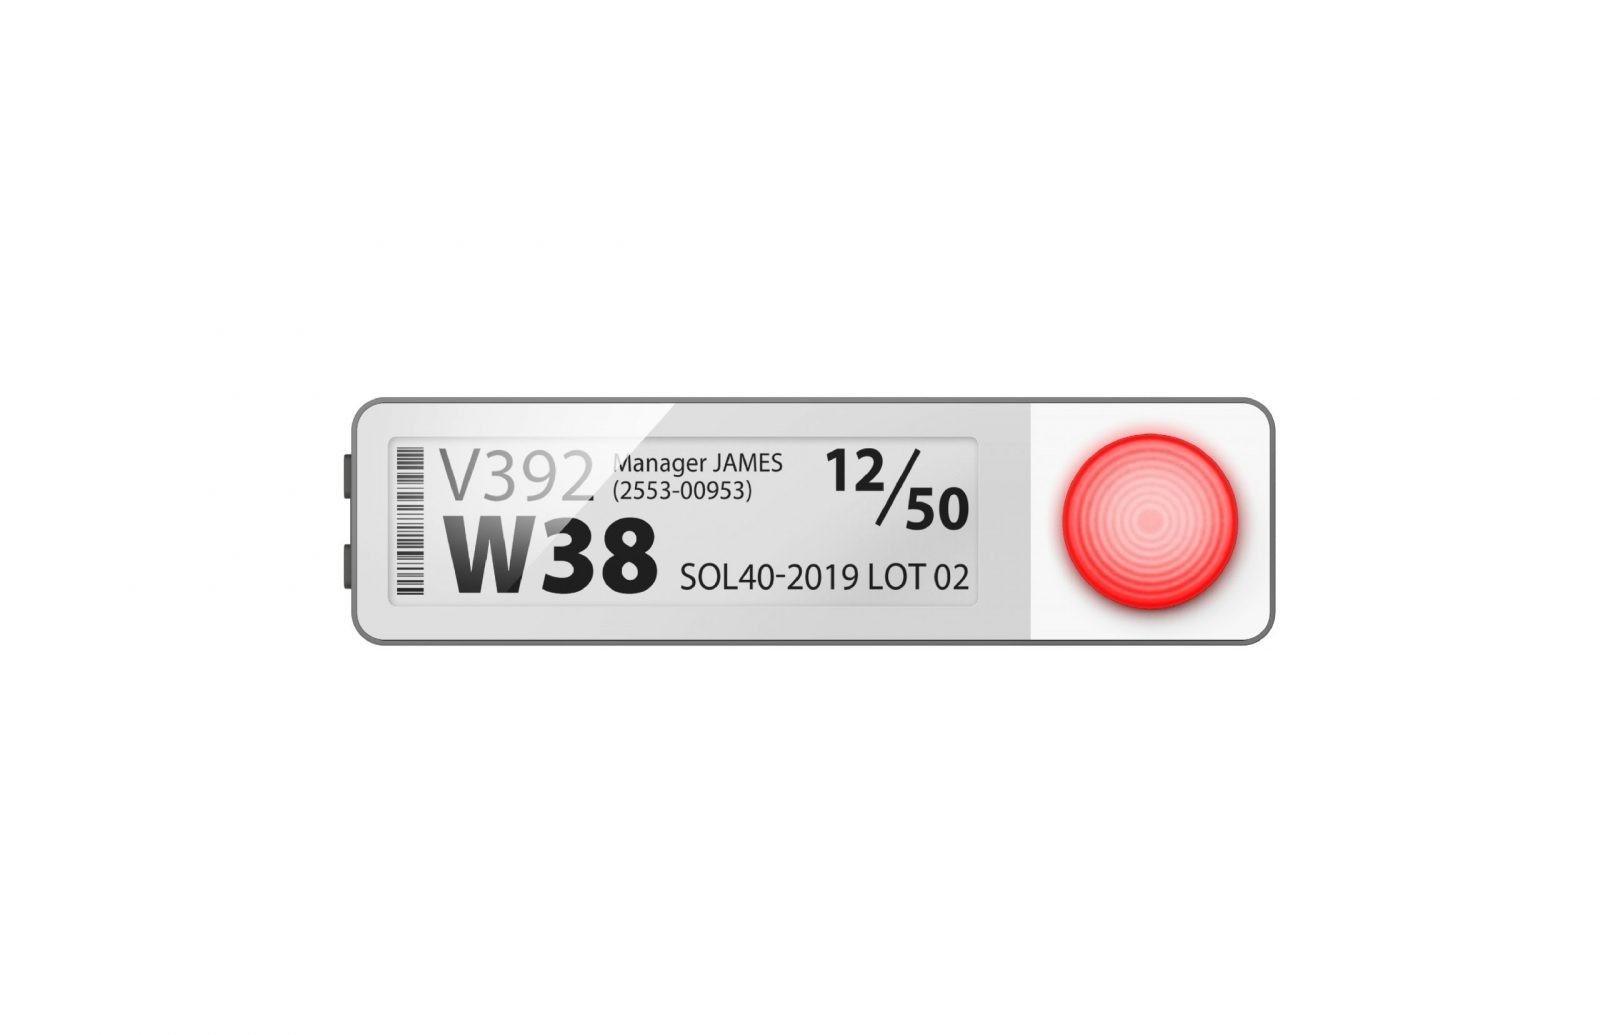 Etichetta elettronica